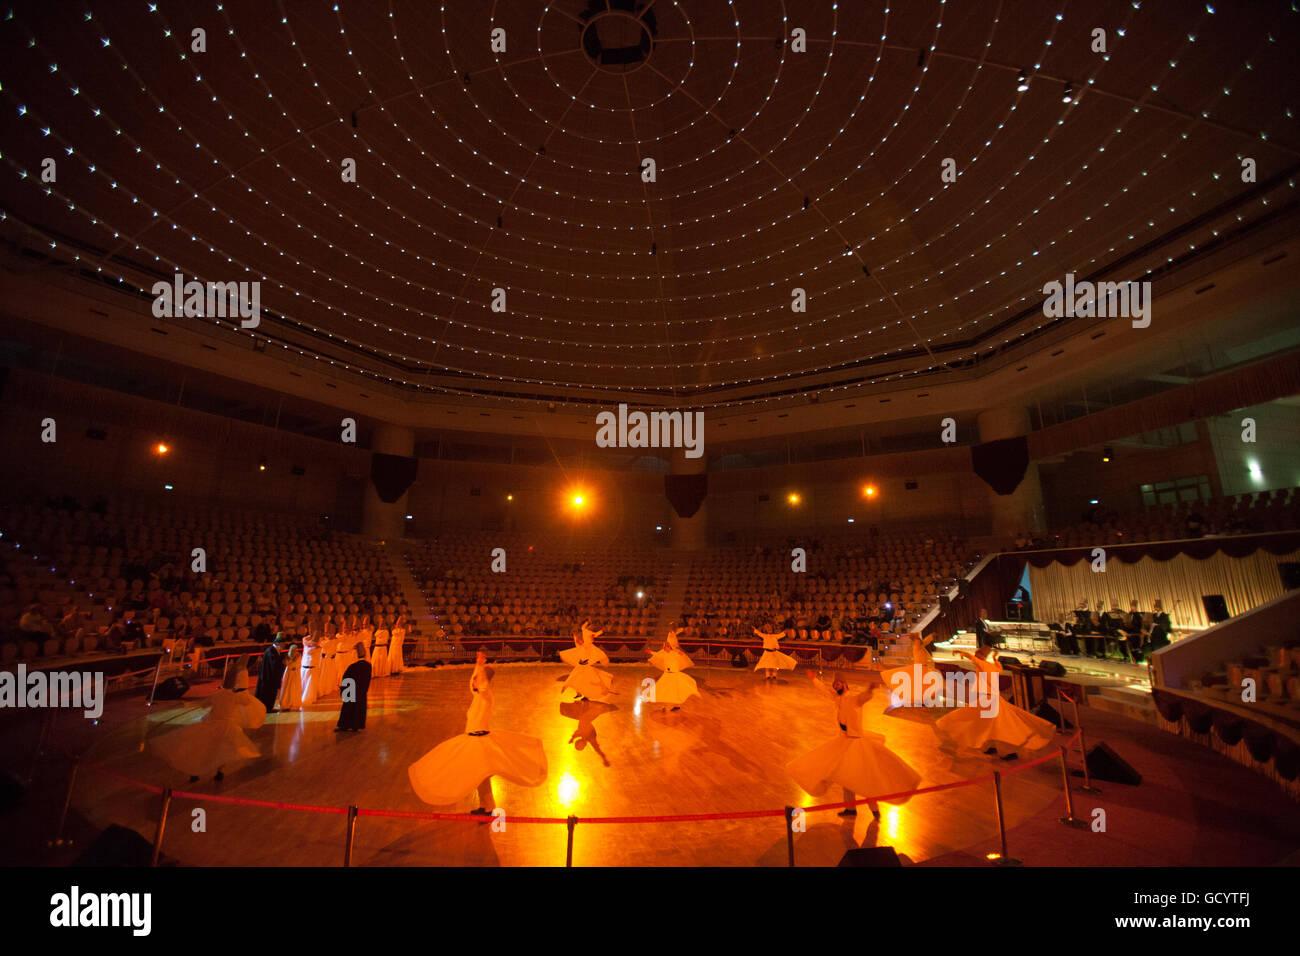 August 18, 2013, Konya,Turkye. Dancing dervishes - Stock Image